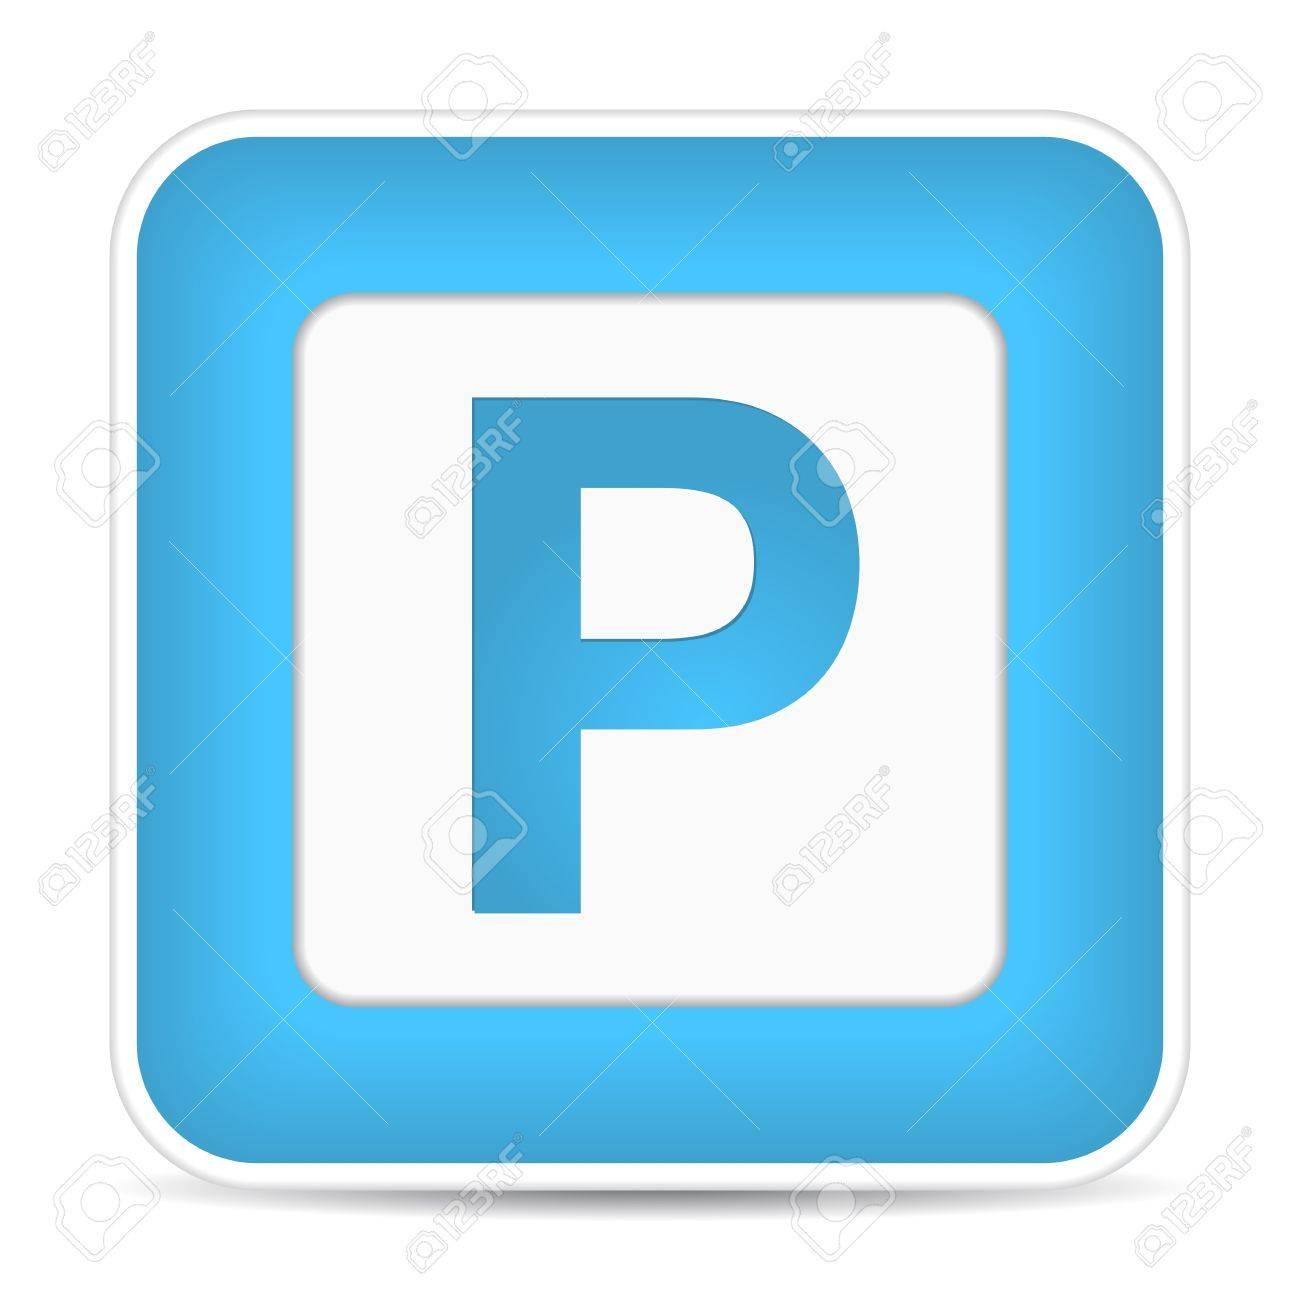 Car parking sign, illustration Stock Vector - 17885173